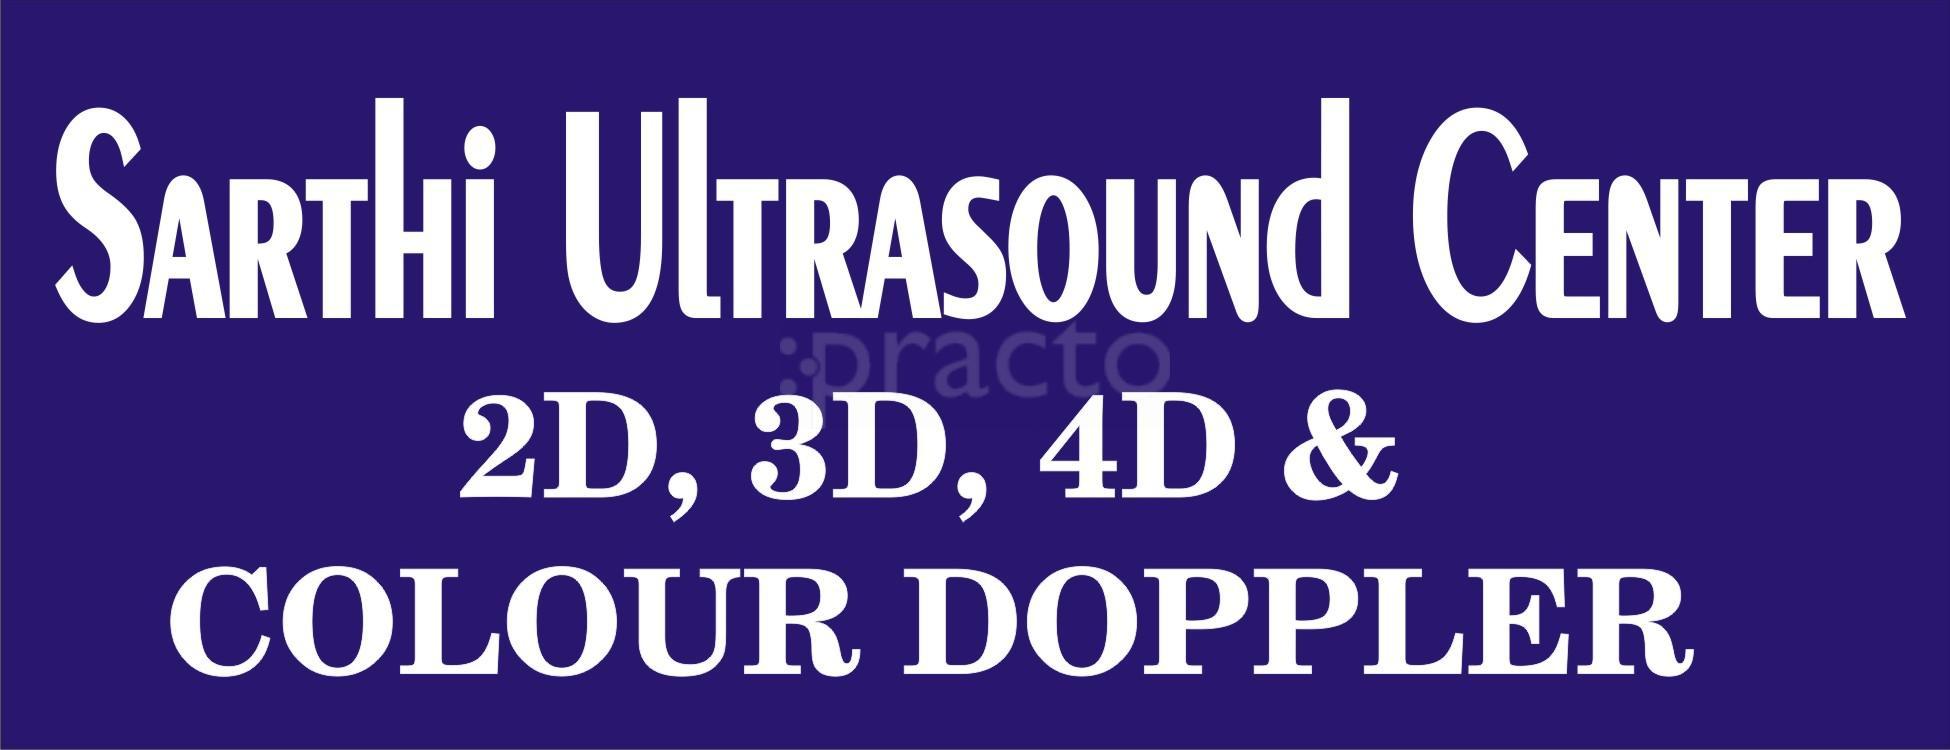 Sarthi Ultrasound & Digital X-Ray Center